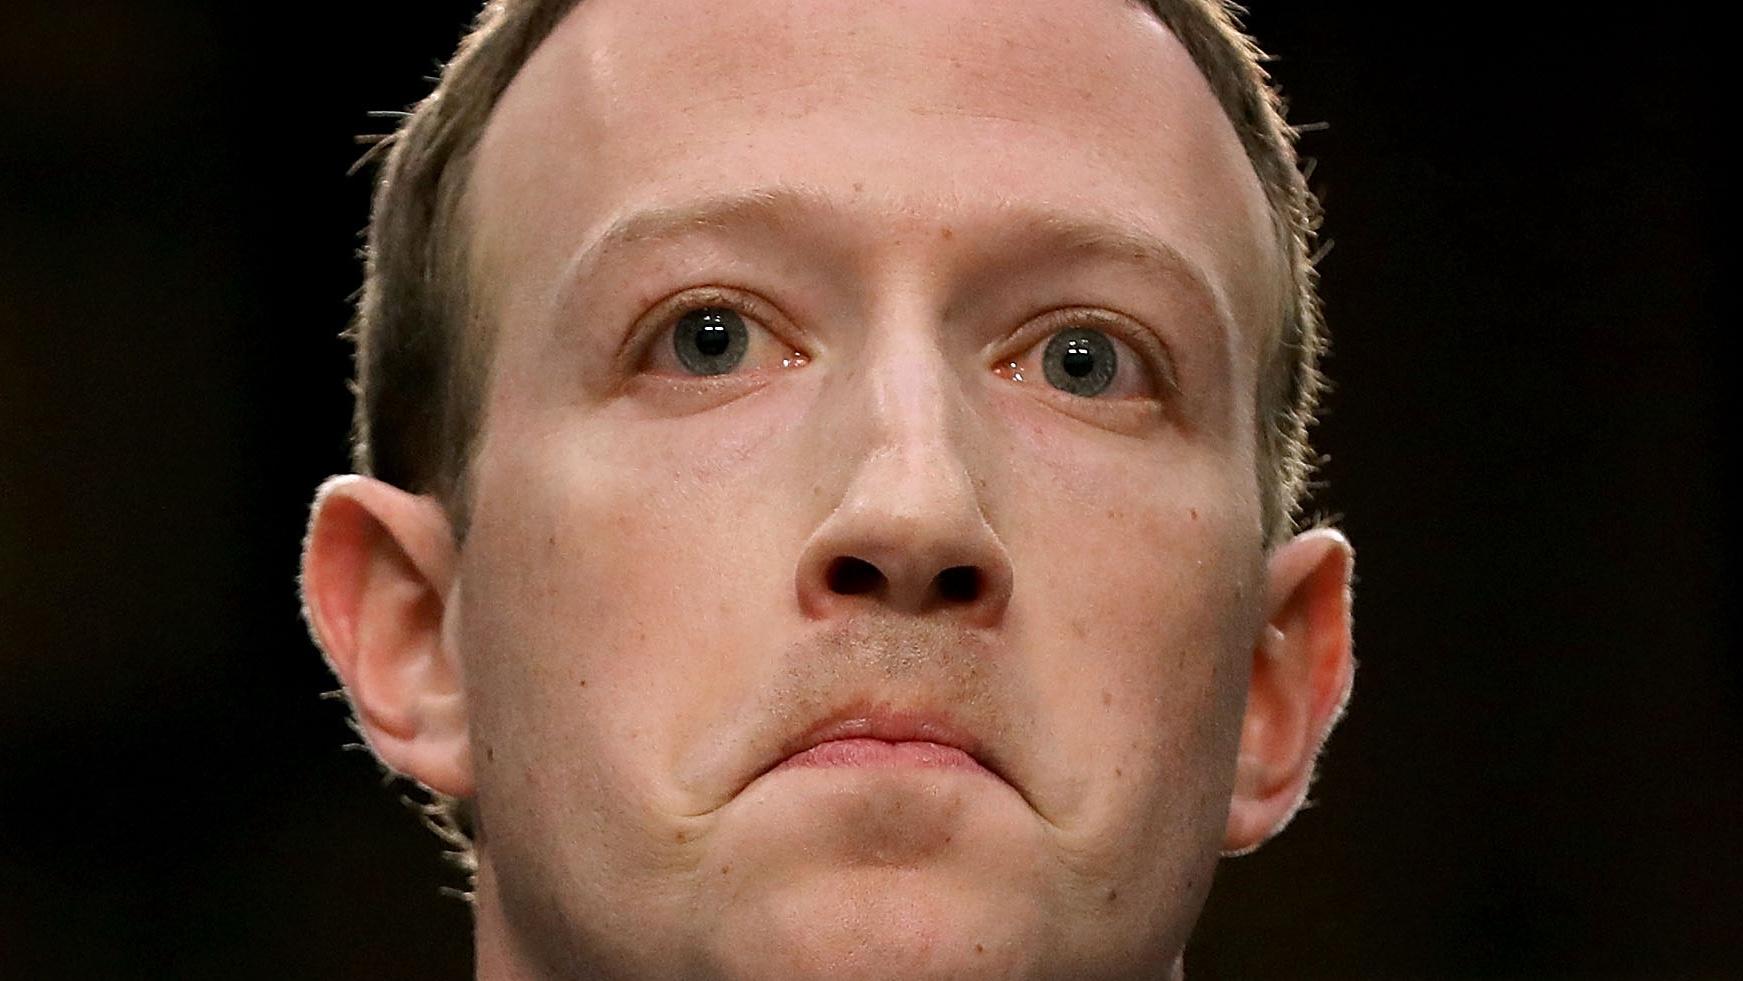 Mark Zuckerberg face 16x9